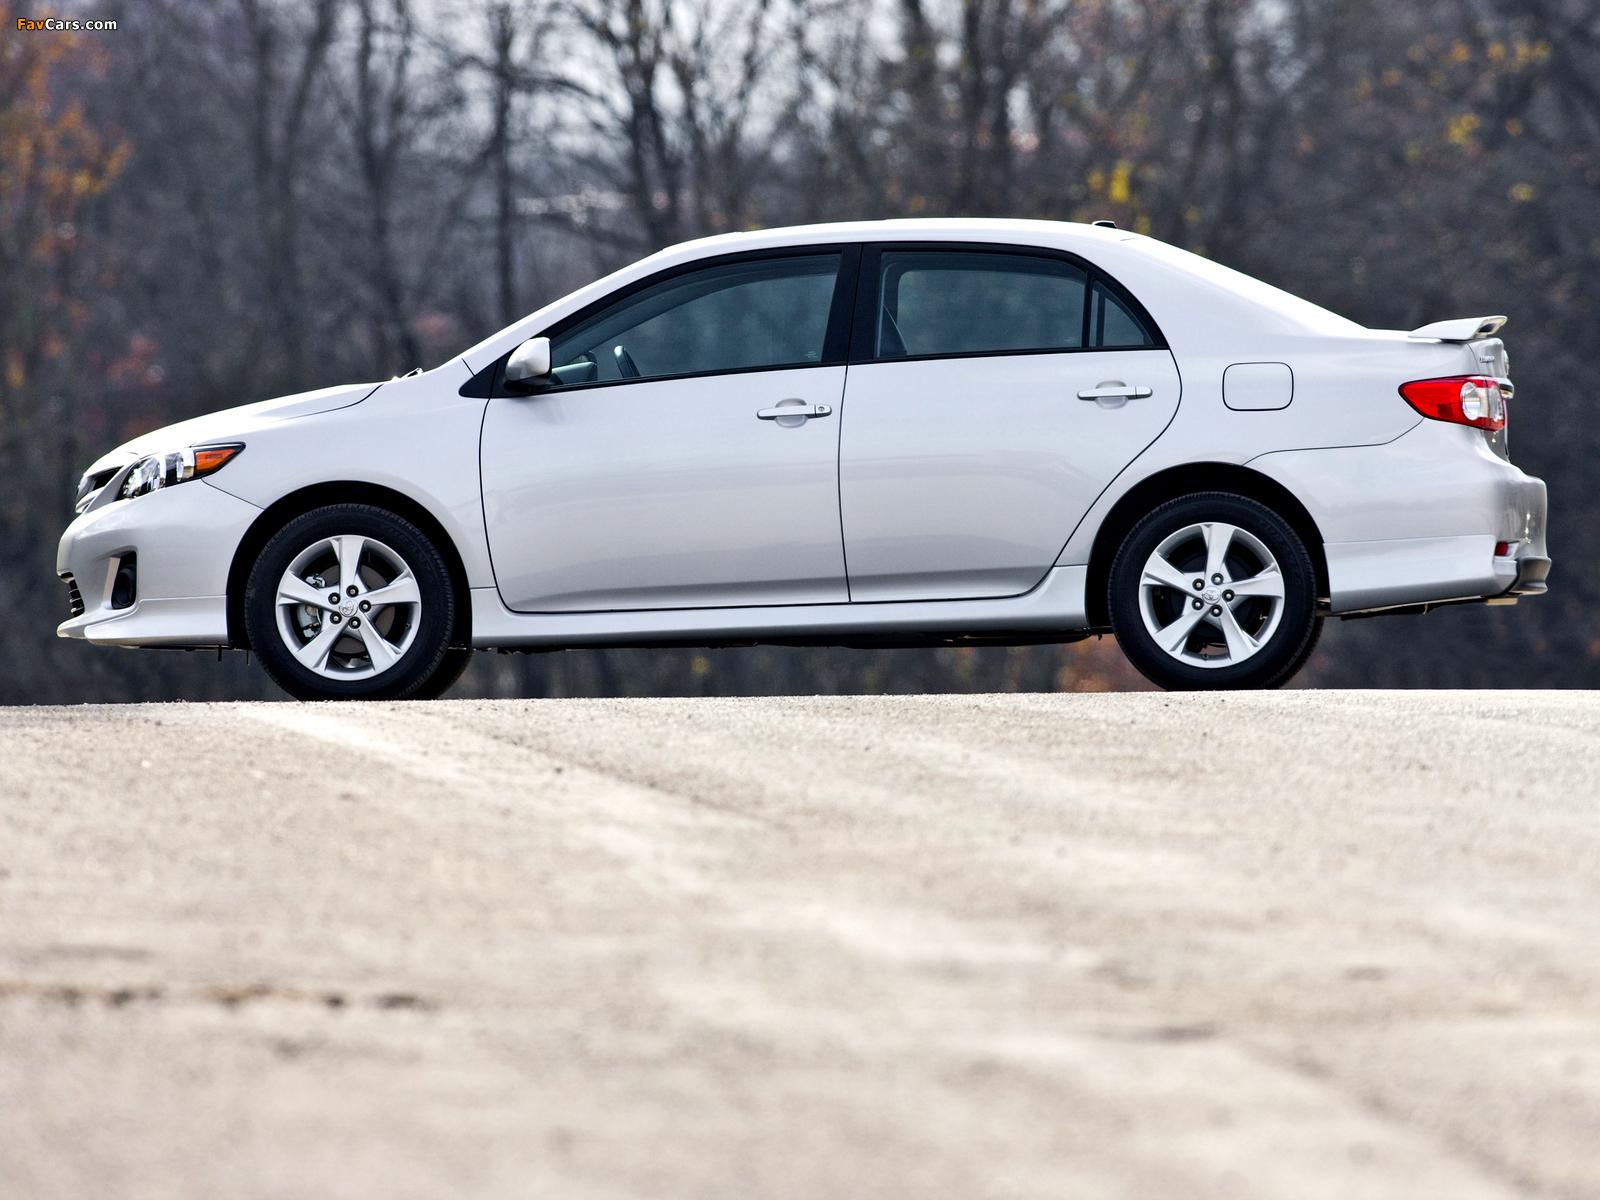 Toyota Corrola  Car S